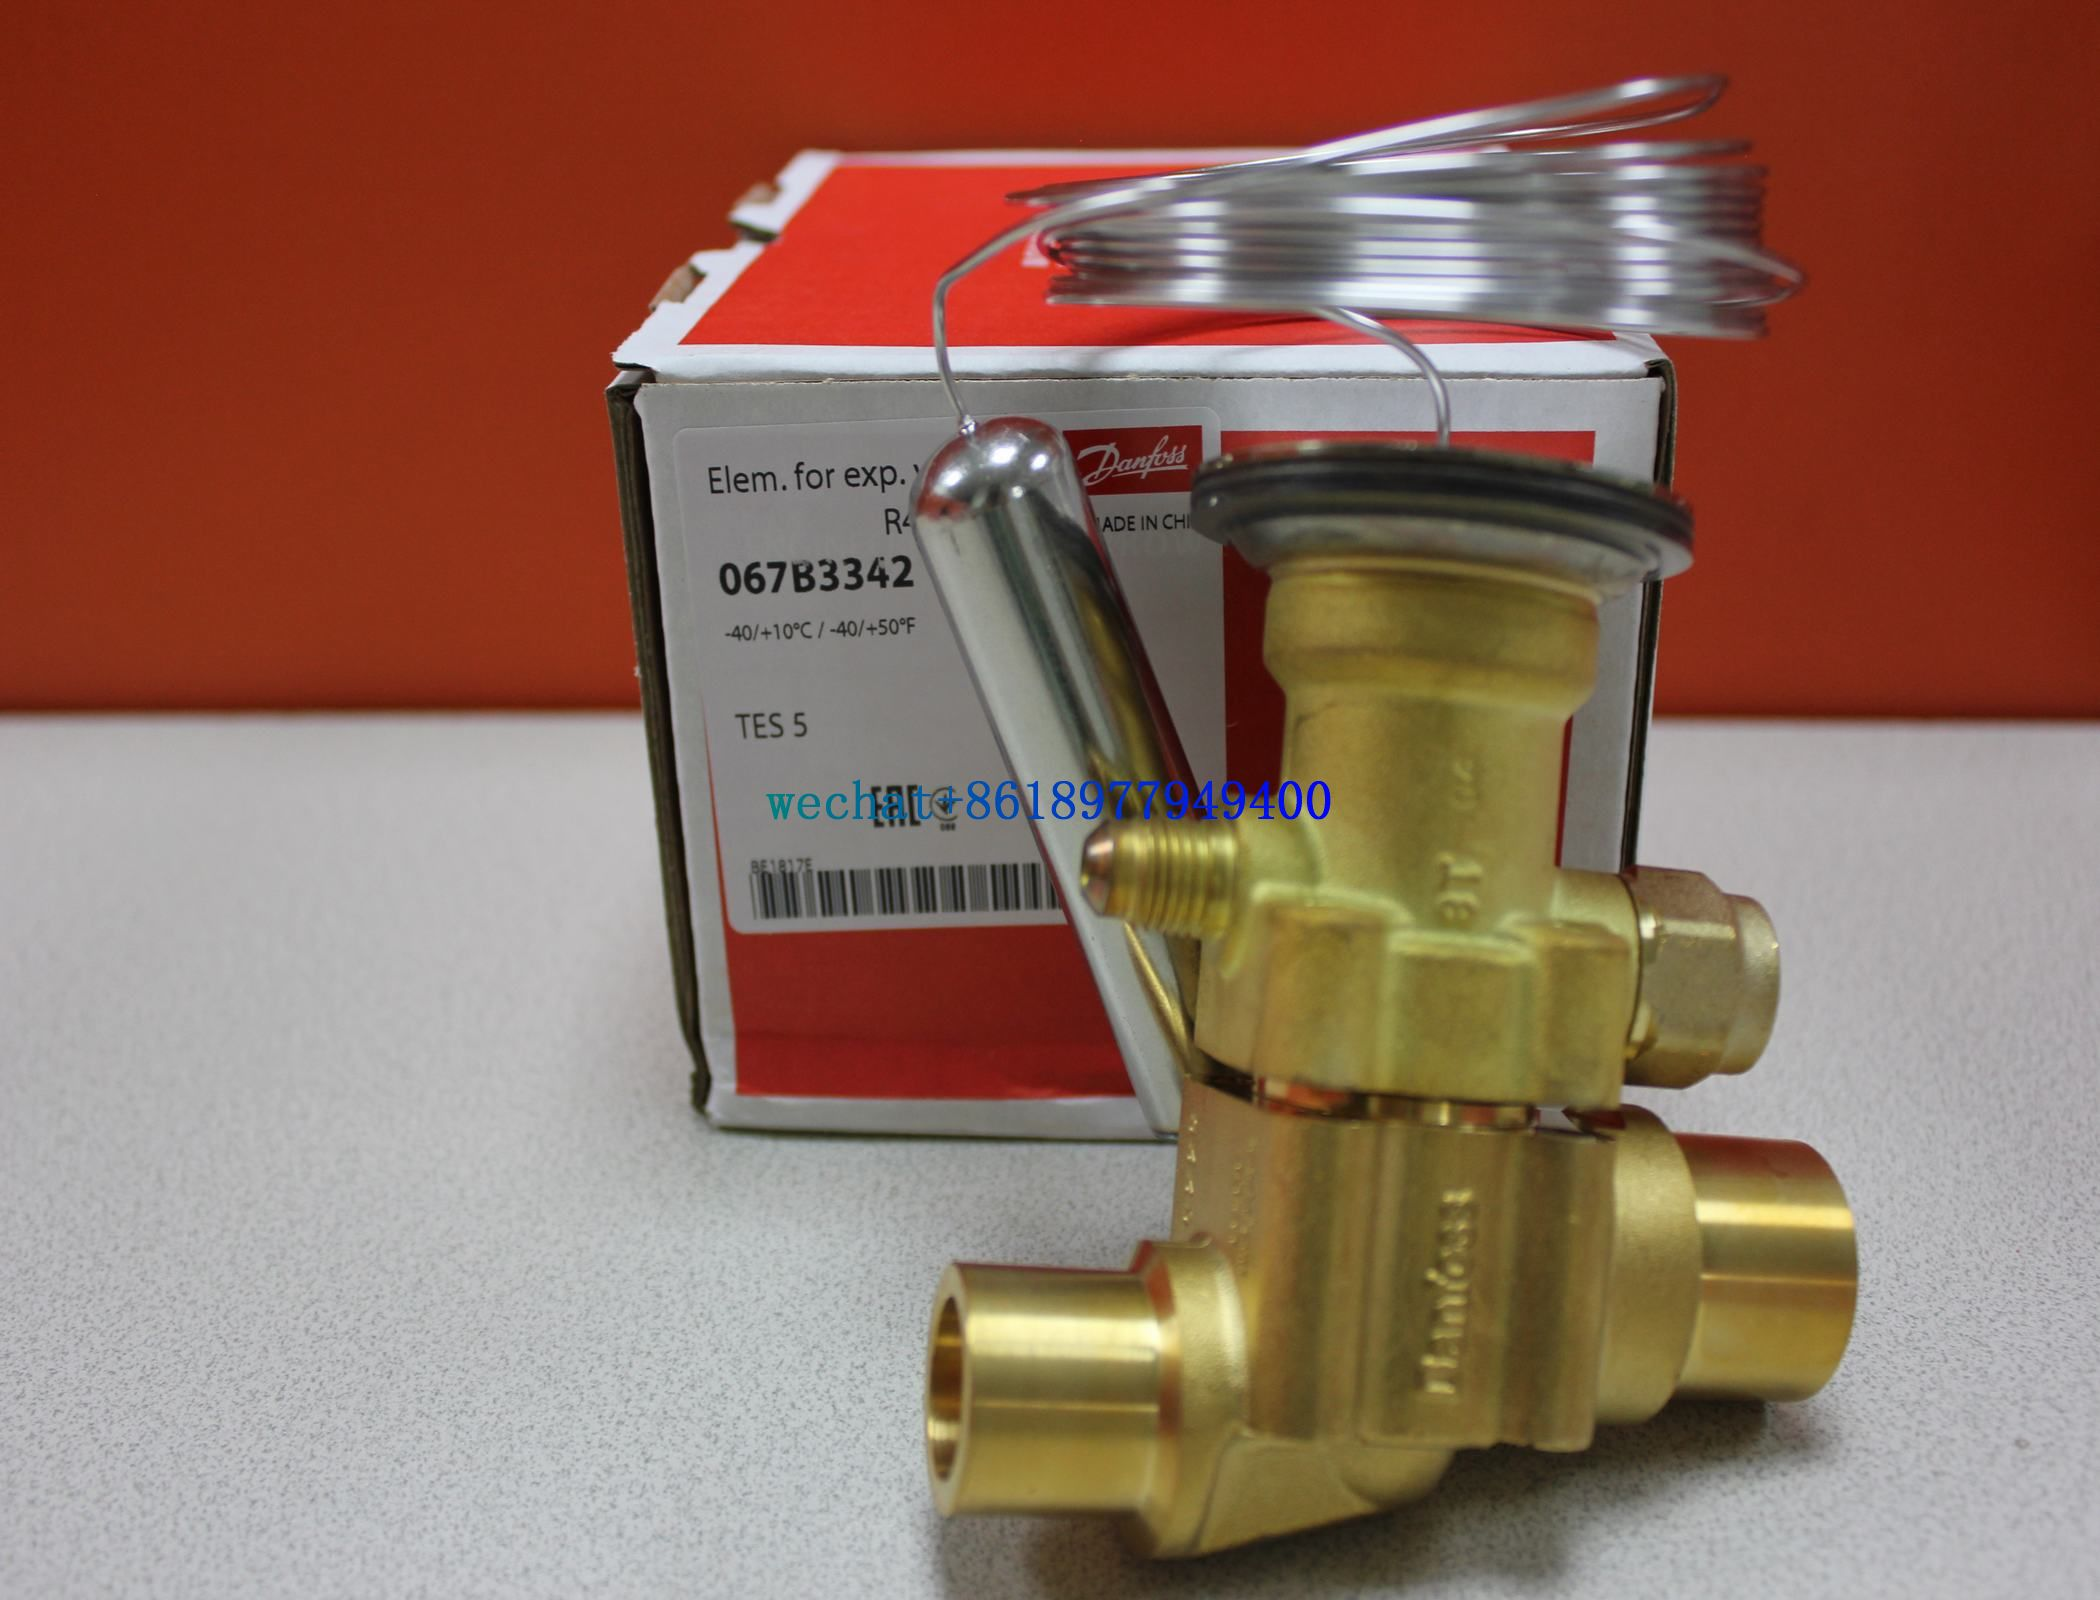 Expansion valves types TEX5-TEZ12/TES20-TEN55/067B3250 Danfoss